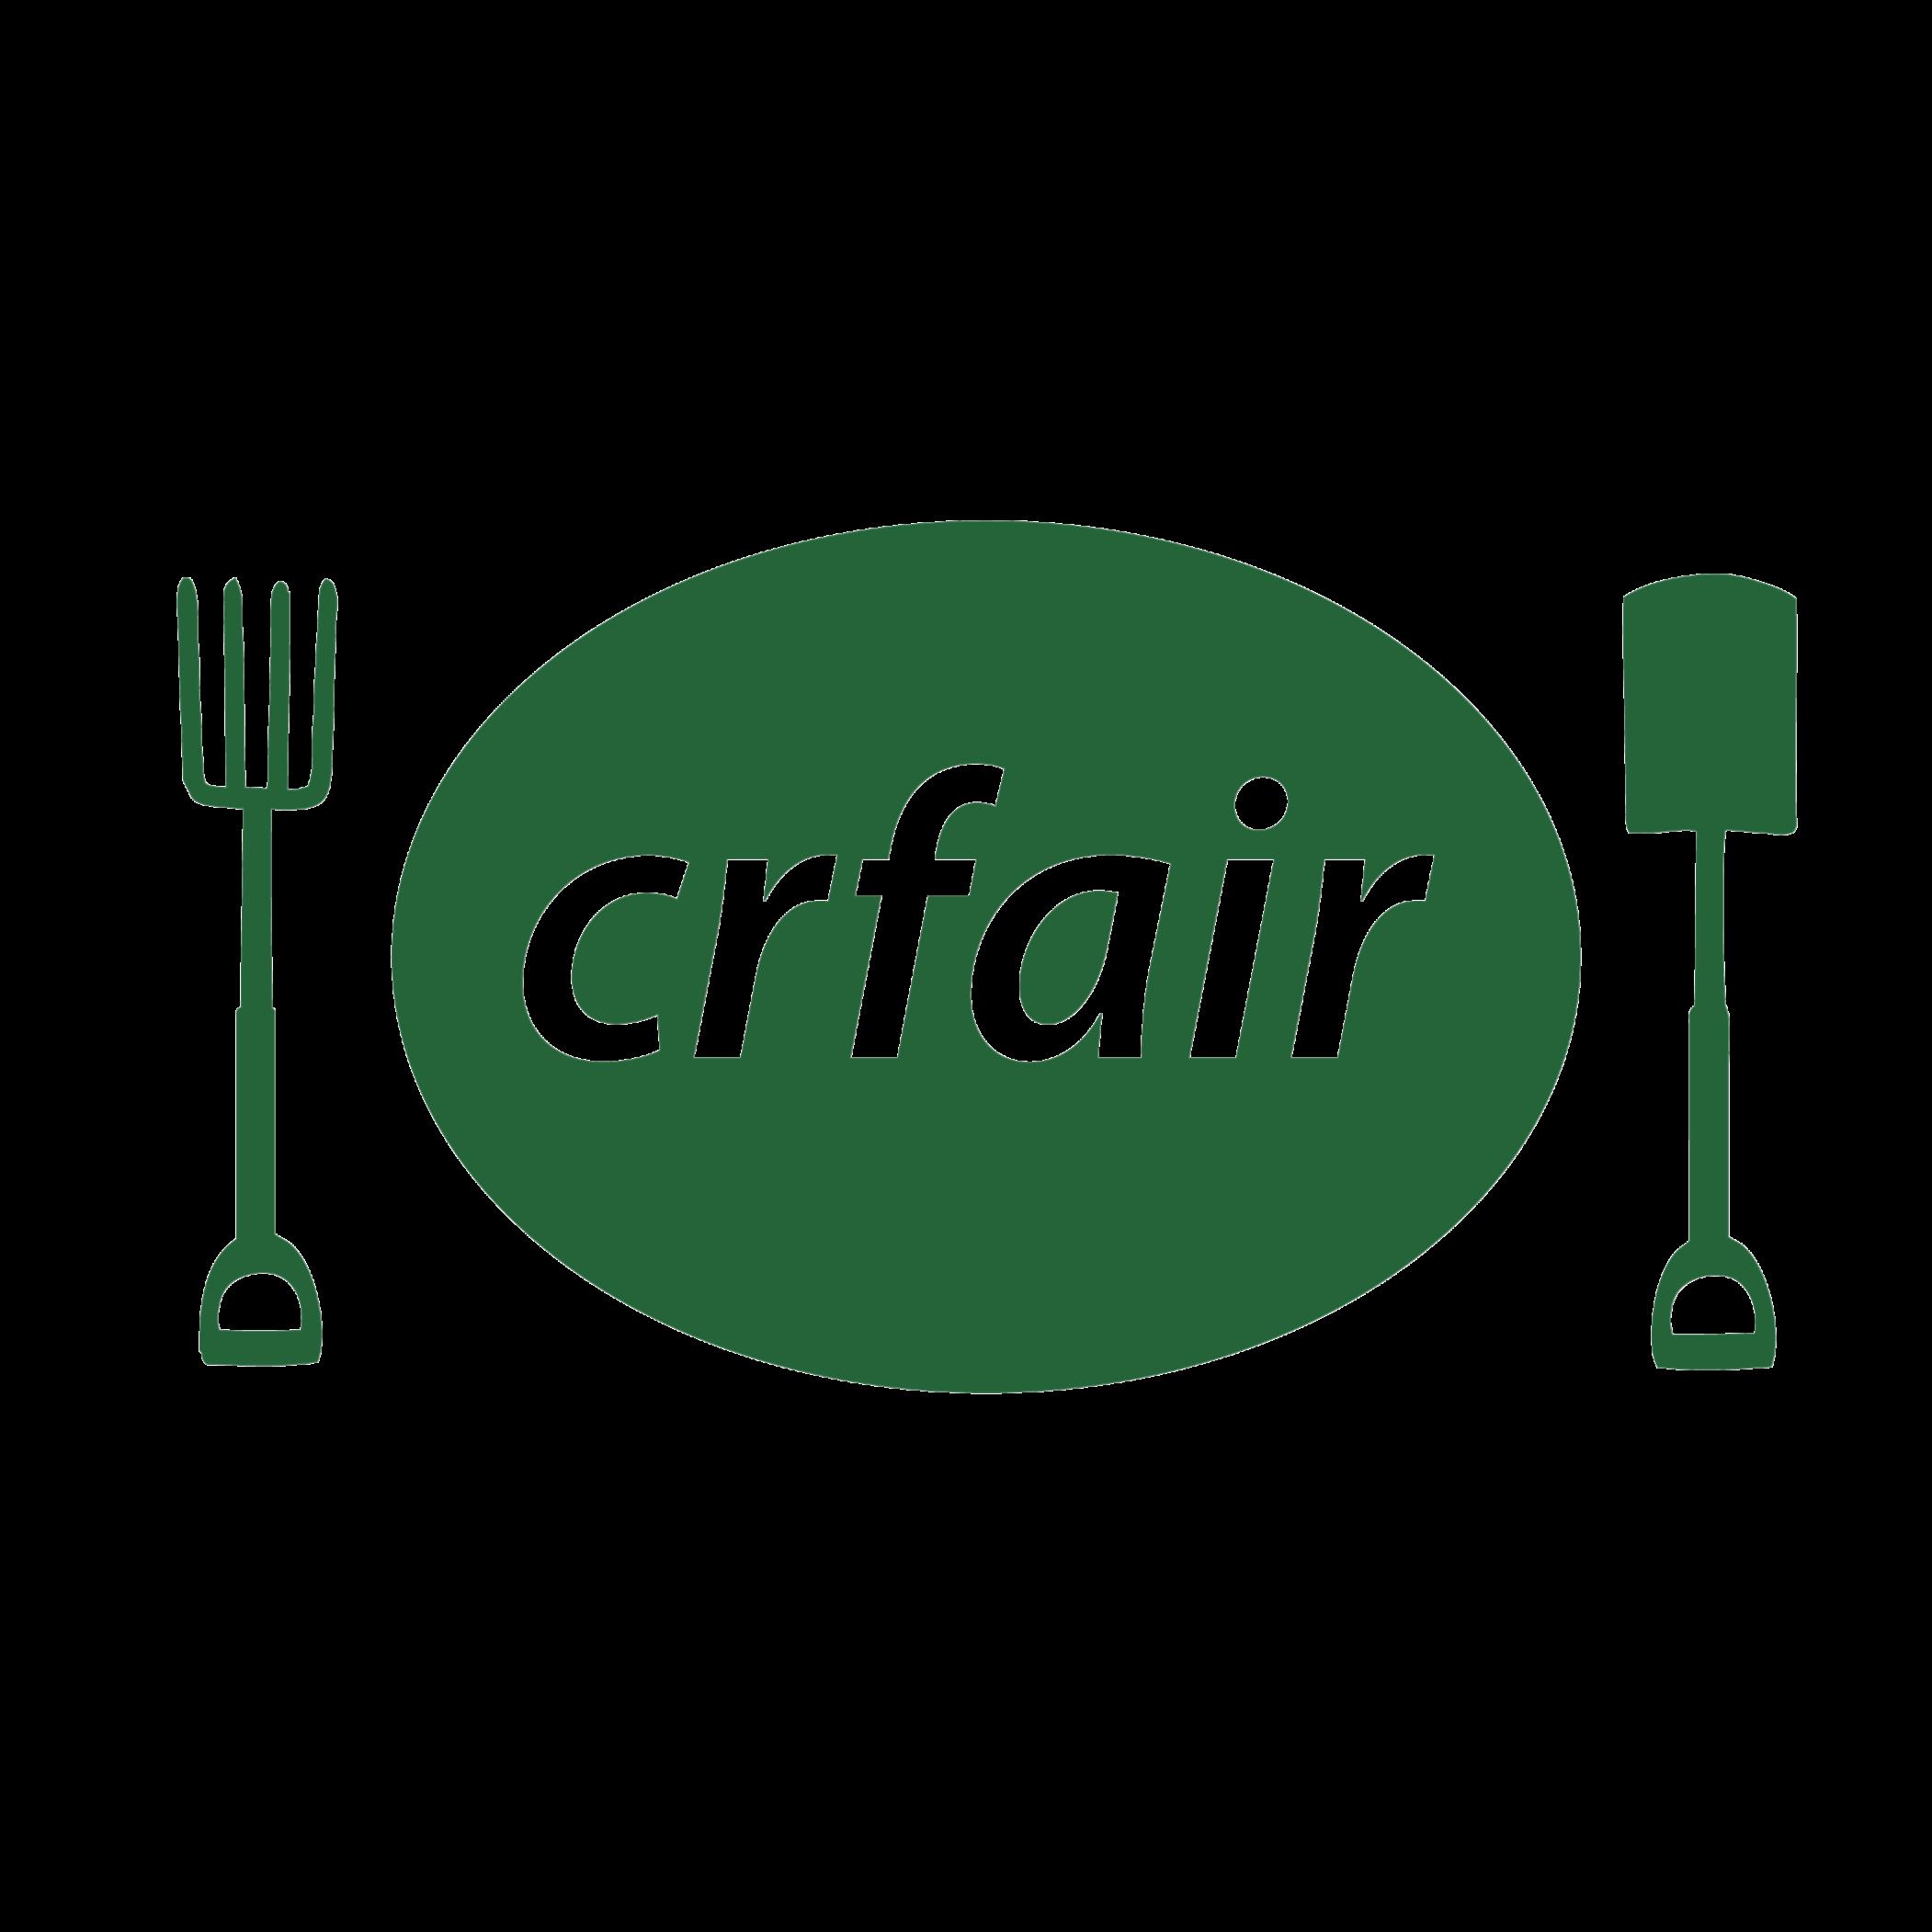 crfair logo transparent (2) (002)_edited